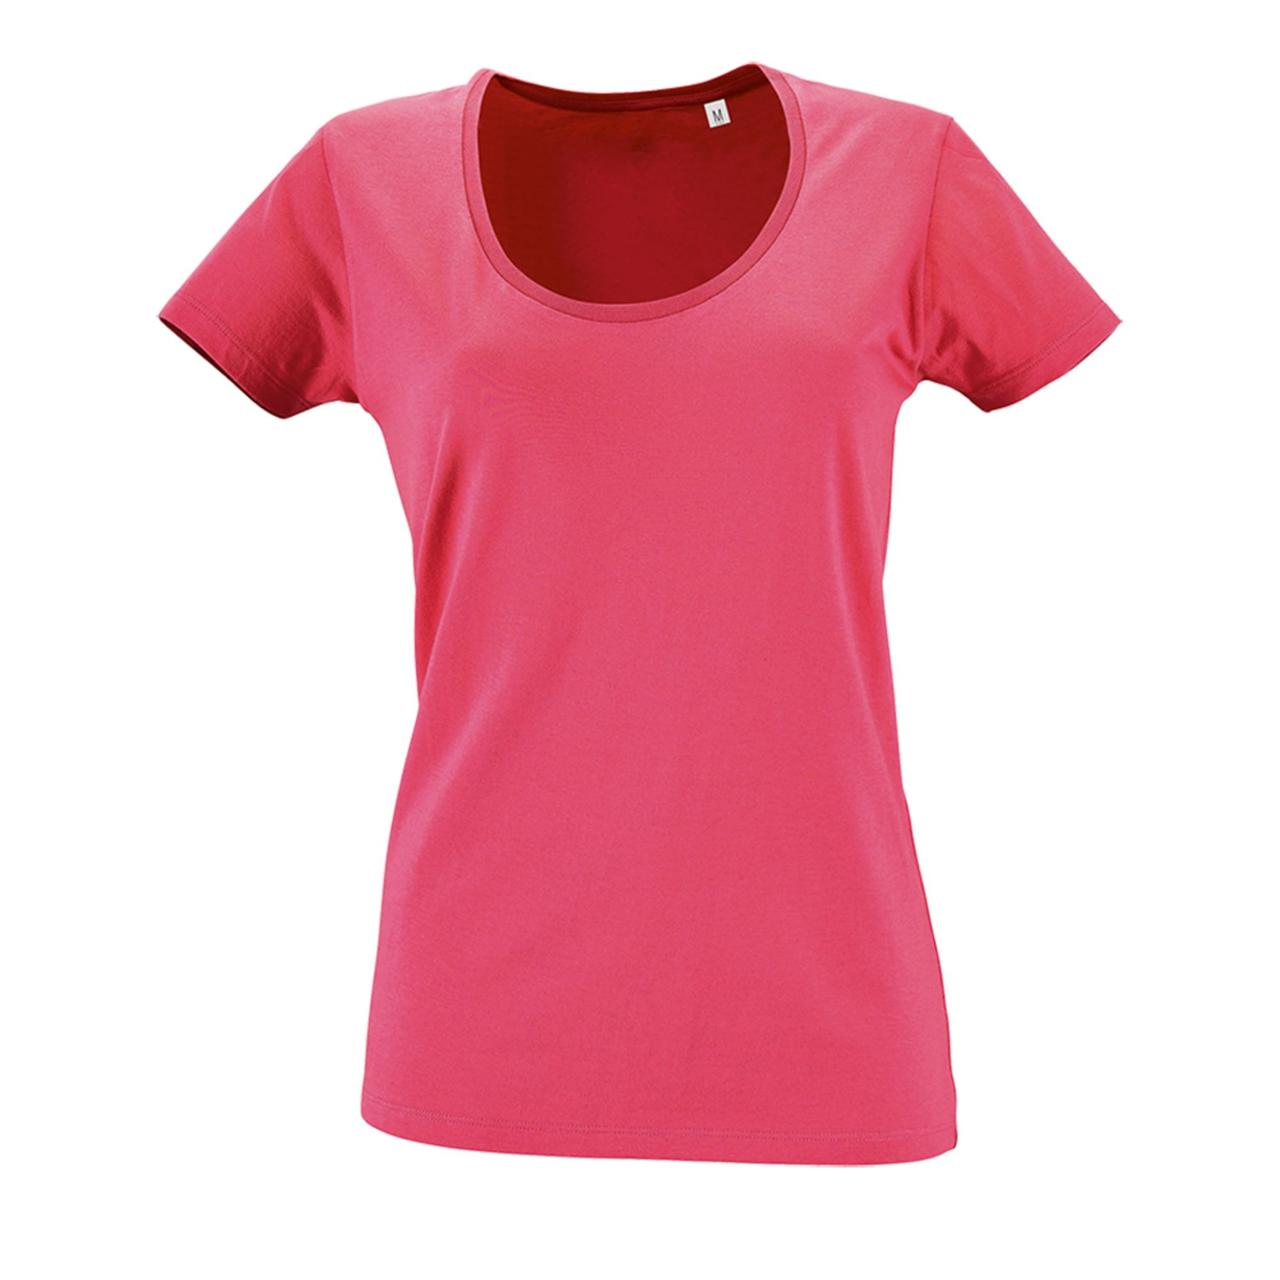 Футболка женская Metropolitan, ярко-розовая (артикул 02079138)